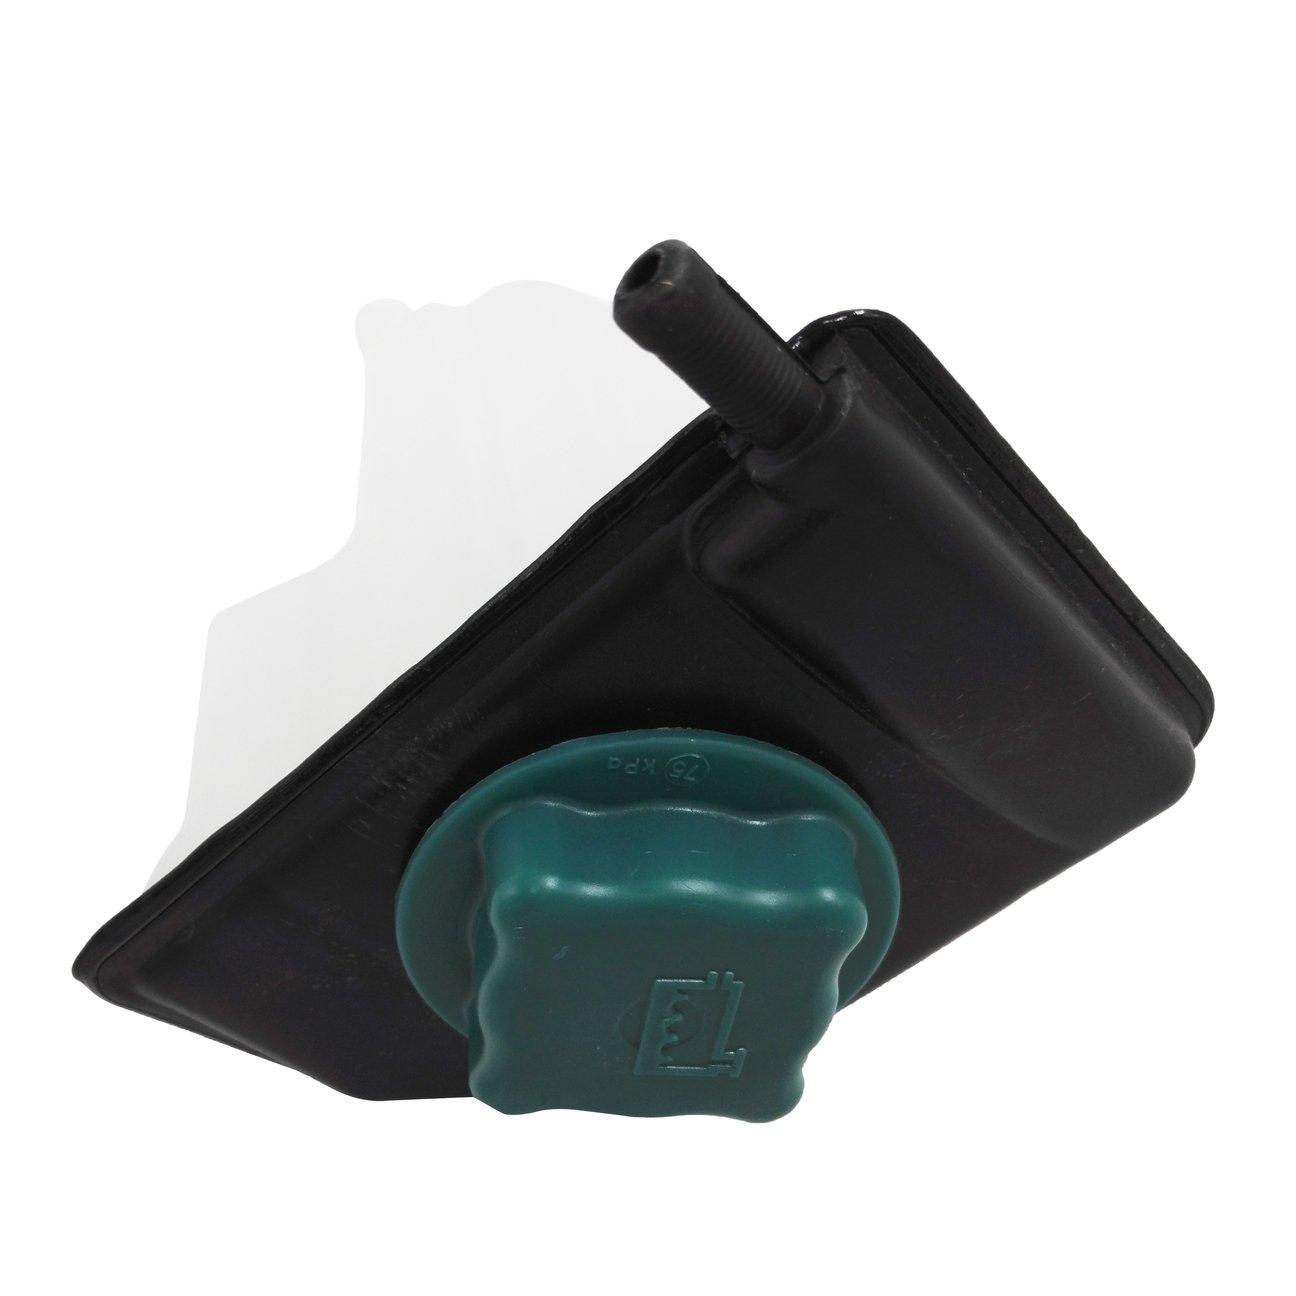 -Black Larson Electronics 1017OJIEZ5A 2012 Lincoln Navigator-Lh Inside Post Mount Spotlight 6 Inch Driver Side with Install Kit Led